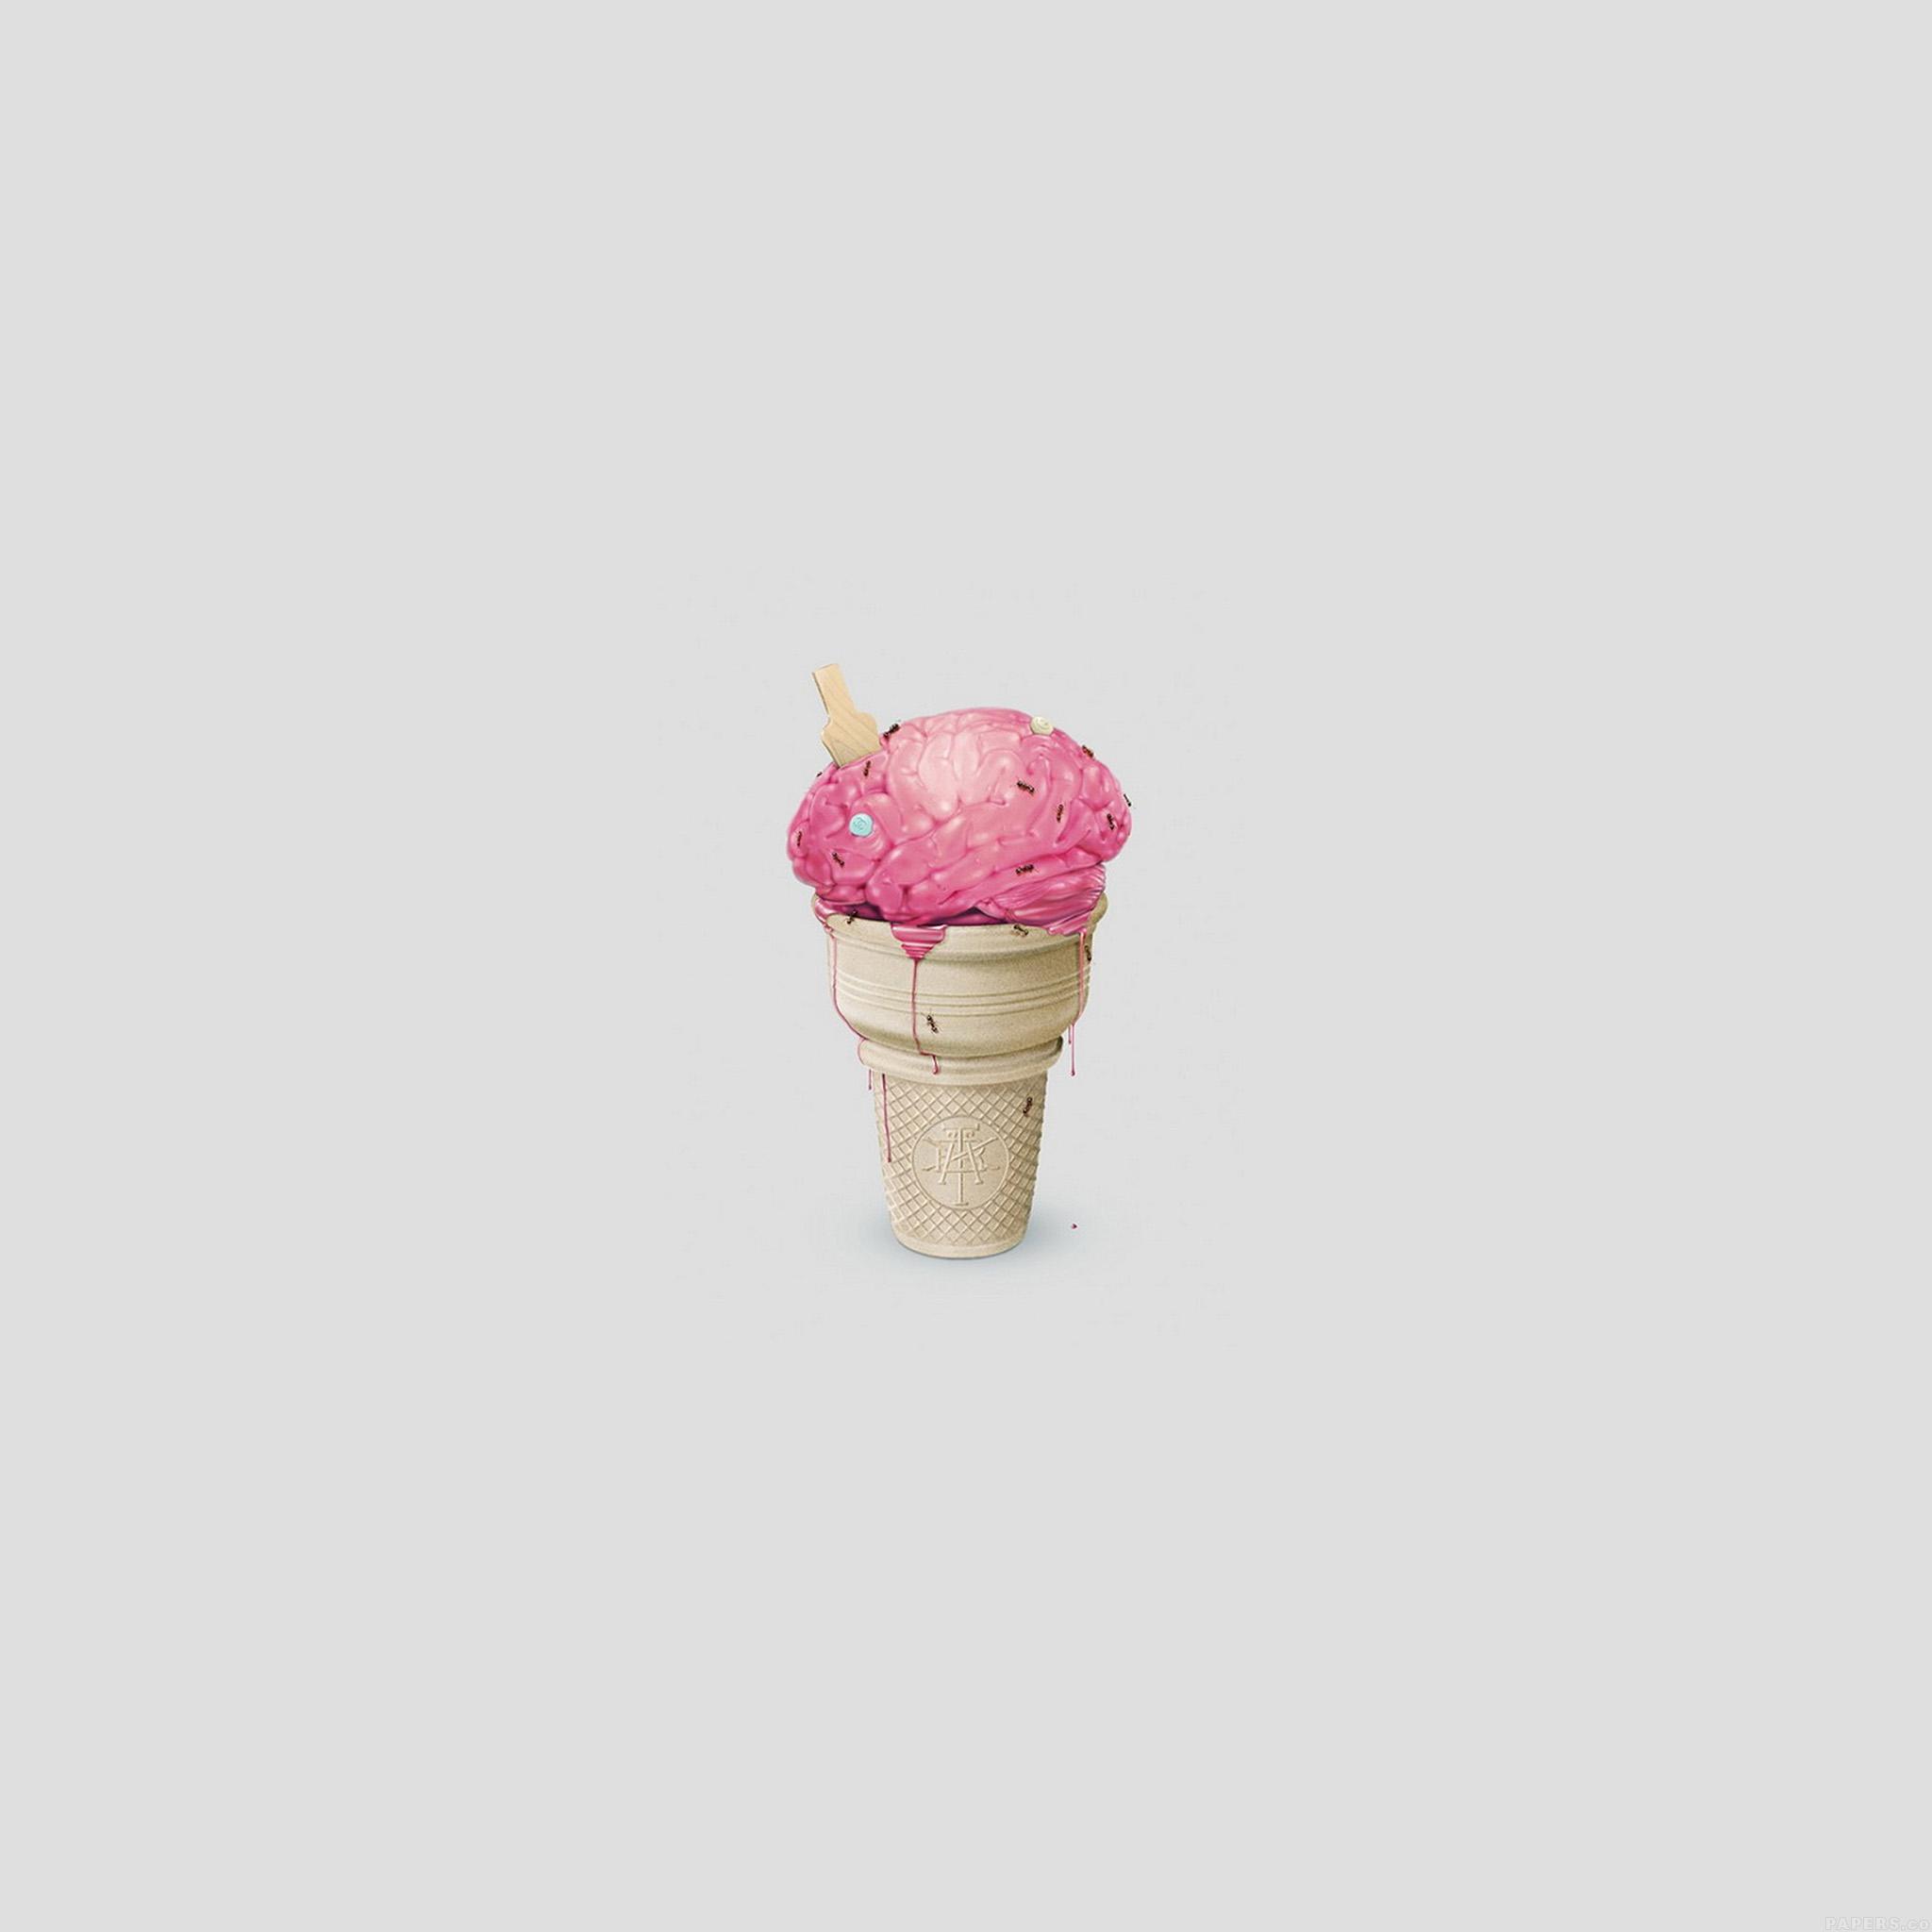 Ice Cream Wallpaper Hd: IPad